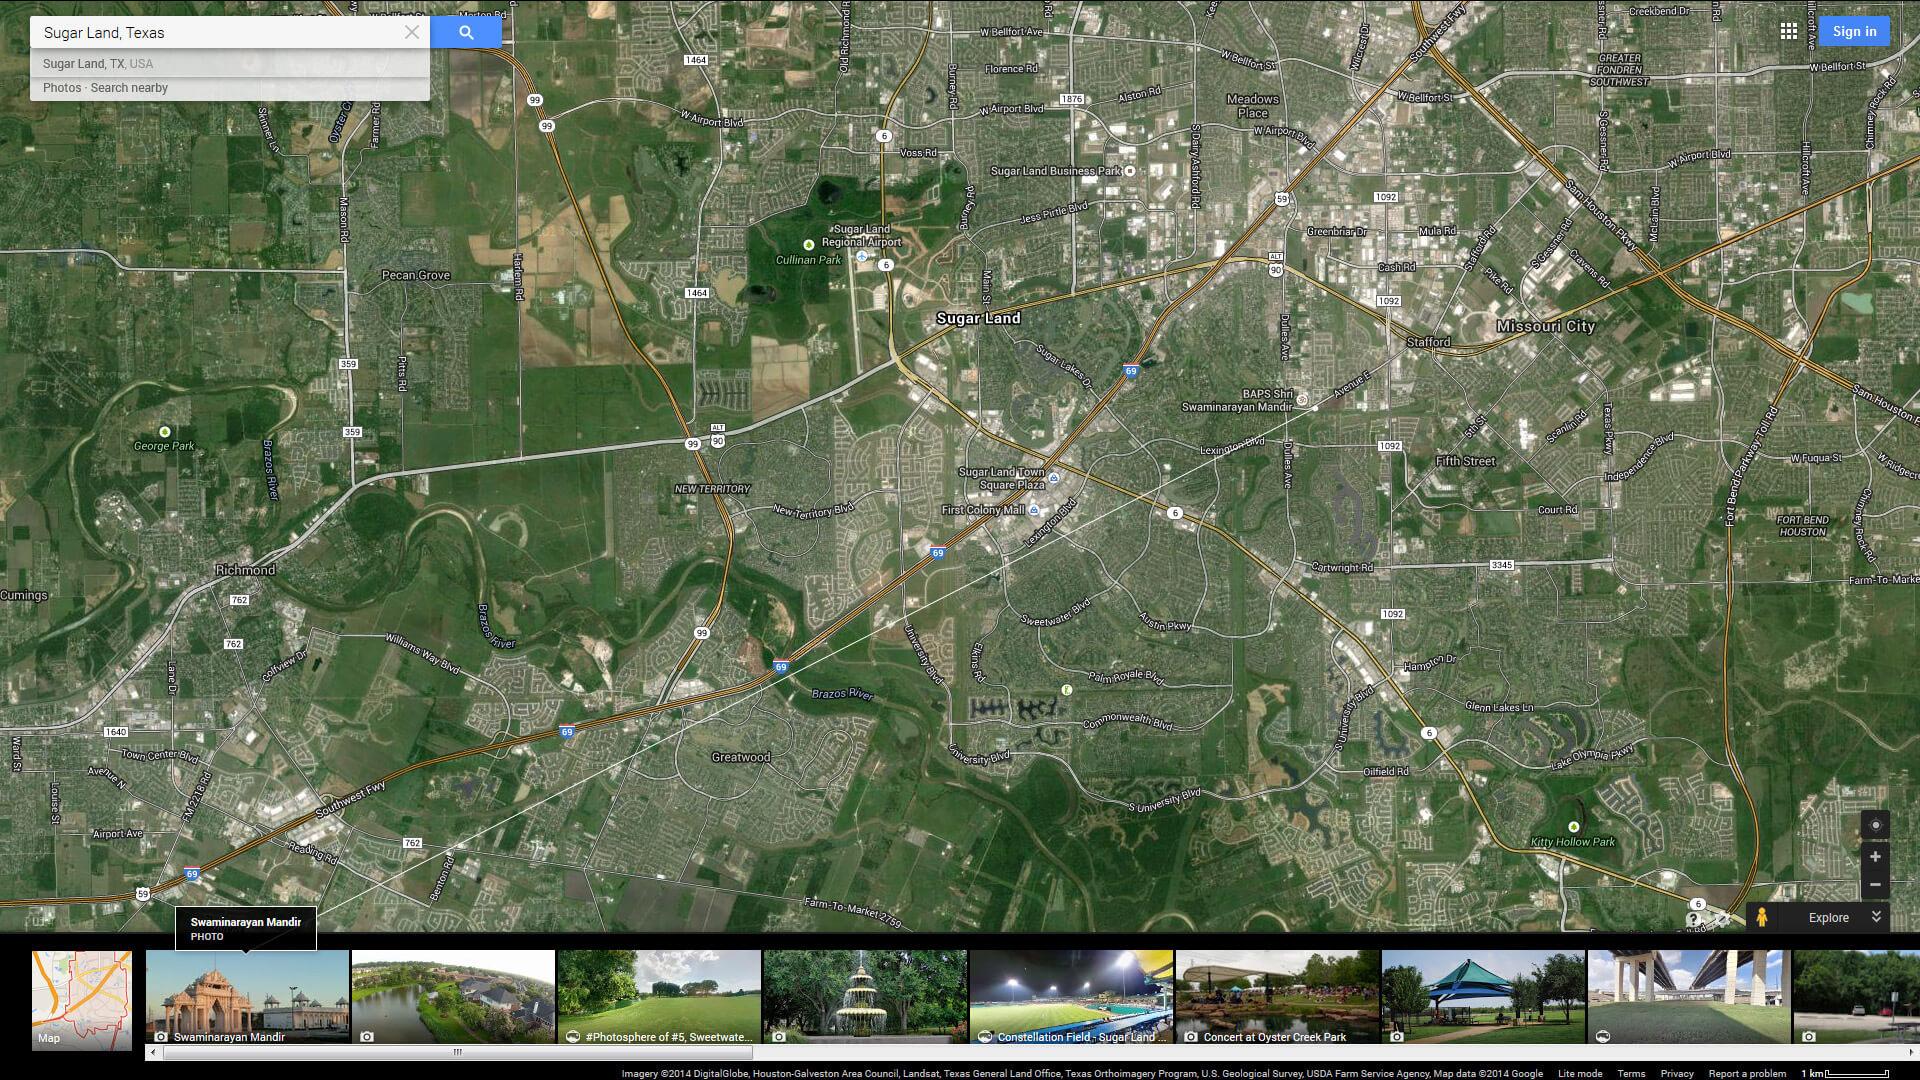 Sugar Land, Texas Map - Sugar Land Texas Map